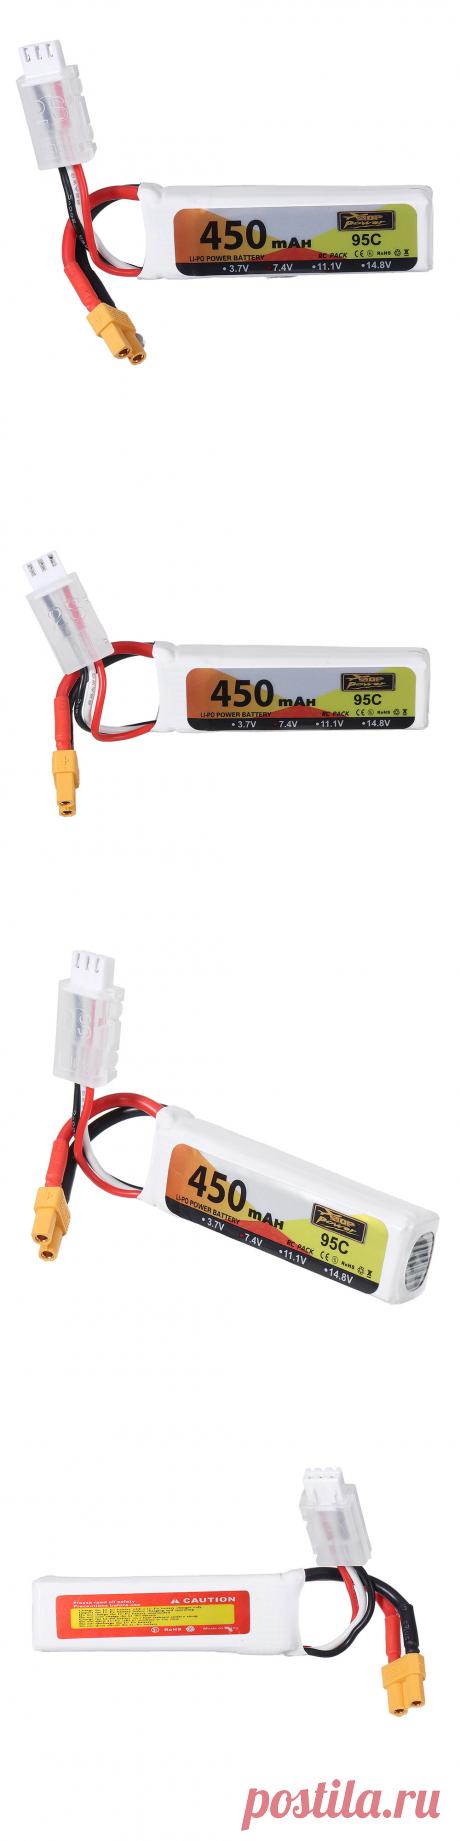 zop power 7.4v 450mah 95c 2s lipo battery xt30 plug for micro fpv racing drone quadcopter Sale - Banggood.com